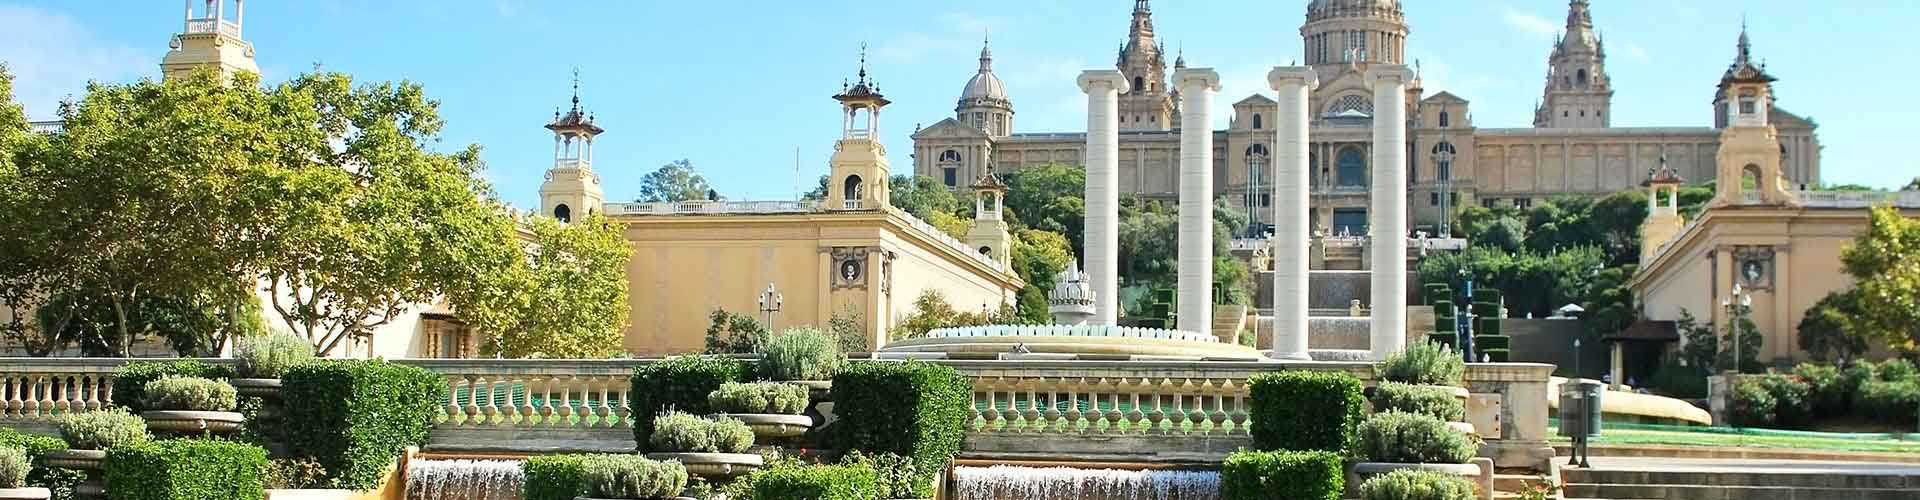 Barcelona - Campamentos cerca a Monumento a Colón. Mapas de Barcelona, Fotos y comentarios de cada Campamento en Barcelona.